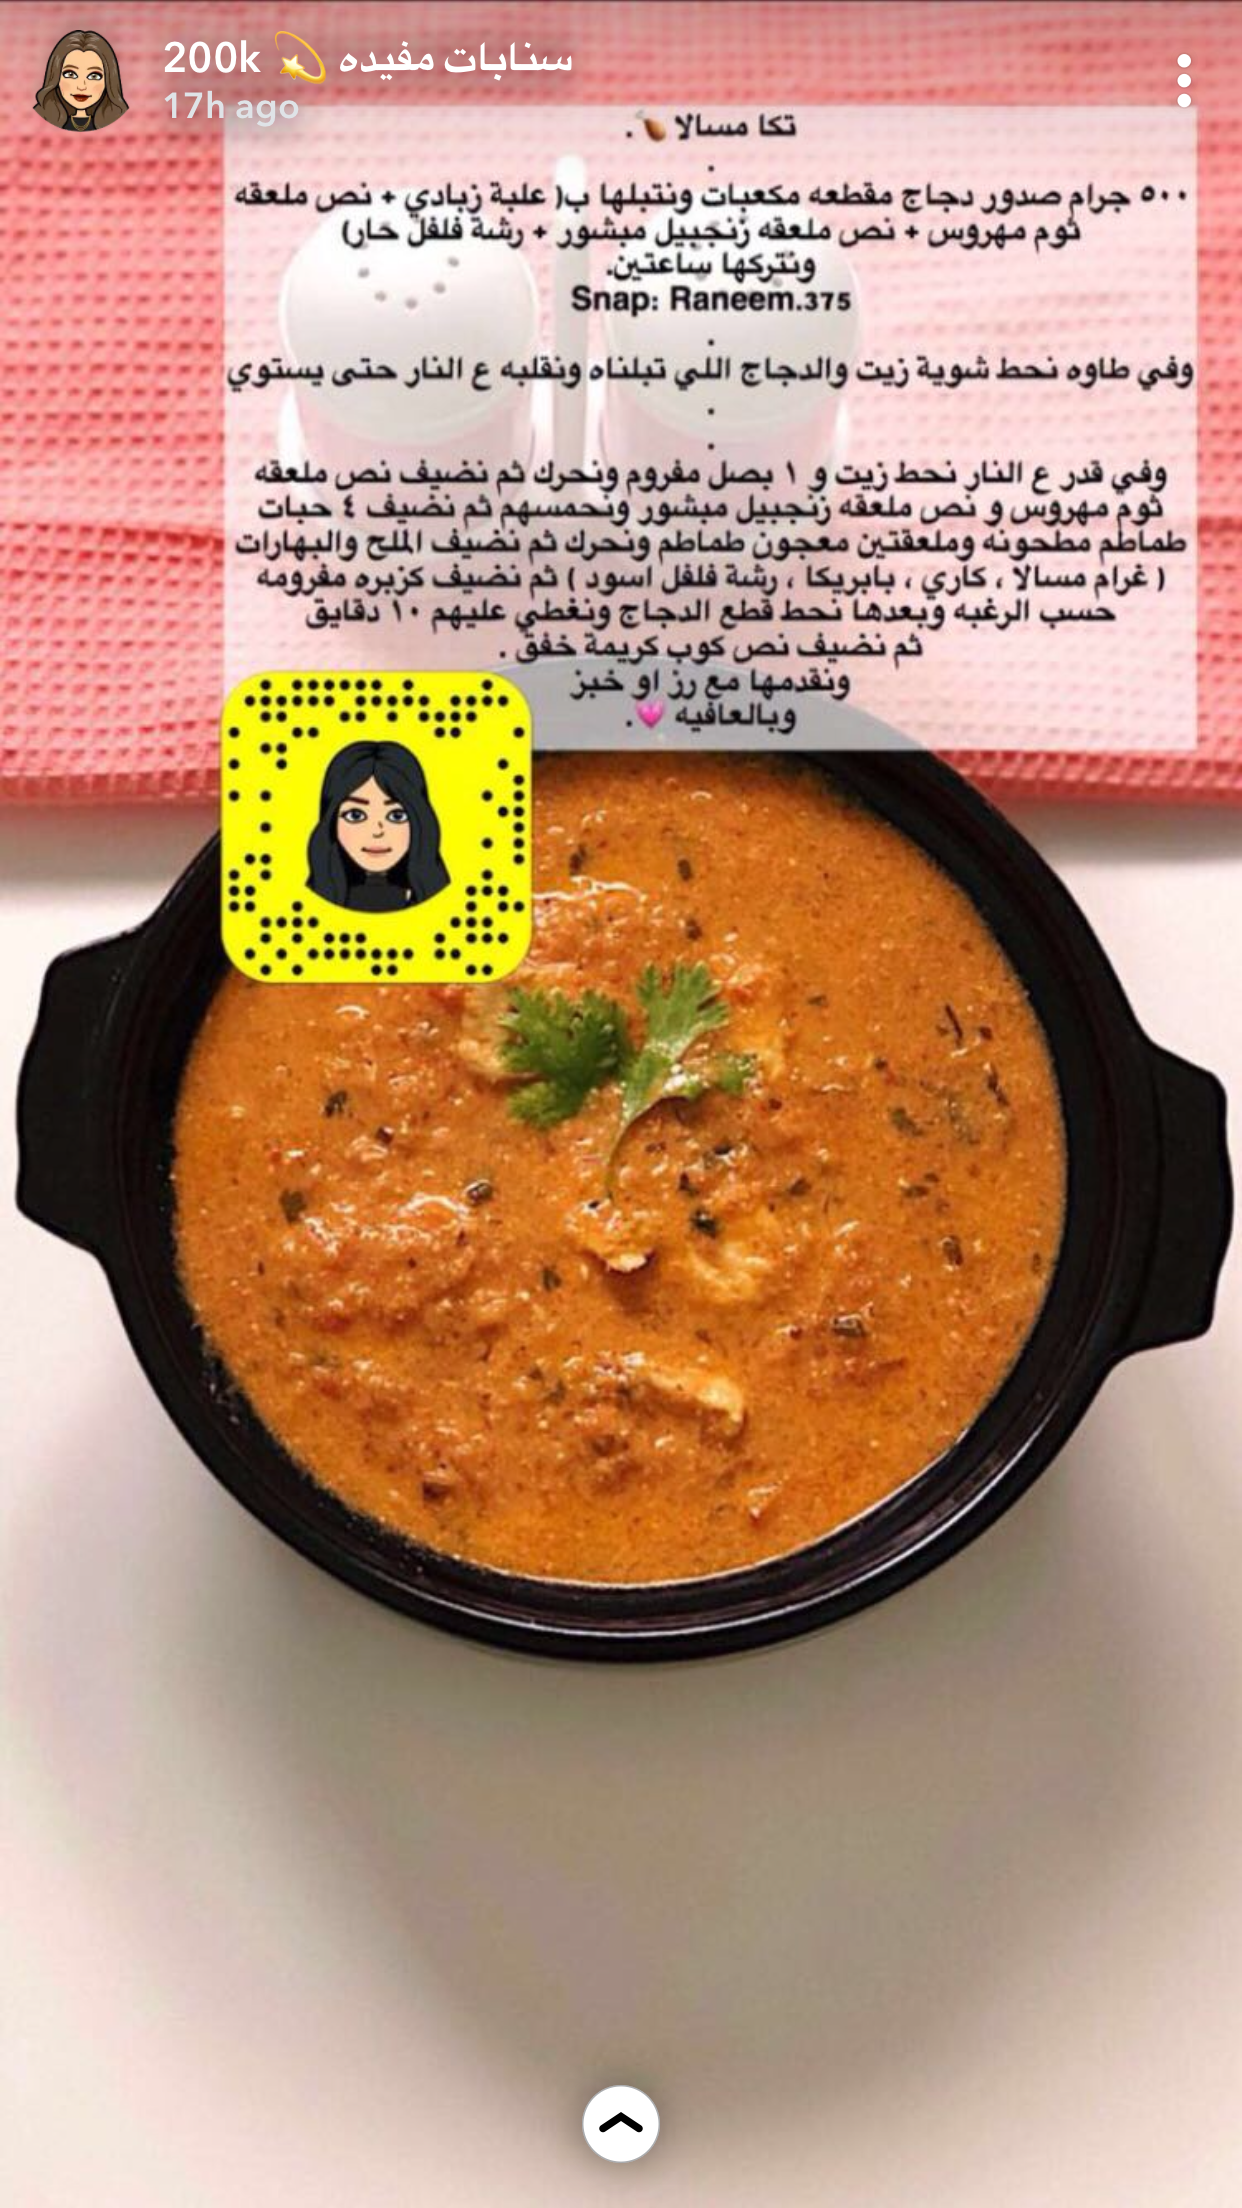 تكا مسالا Indian Cooking Recipes Cookout Food Cooking Recipes